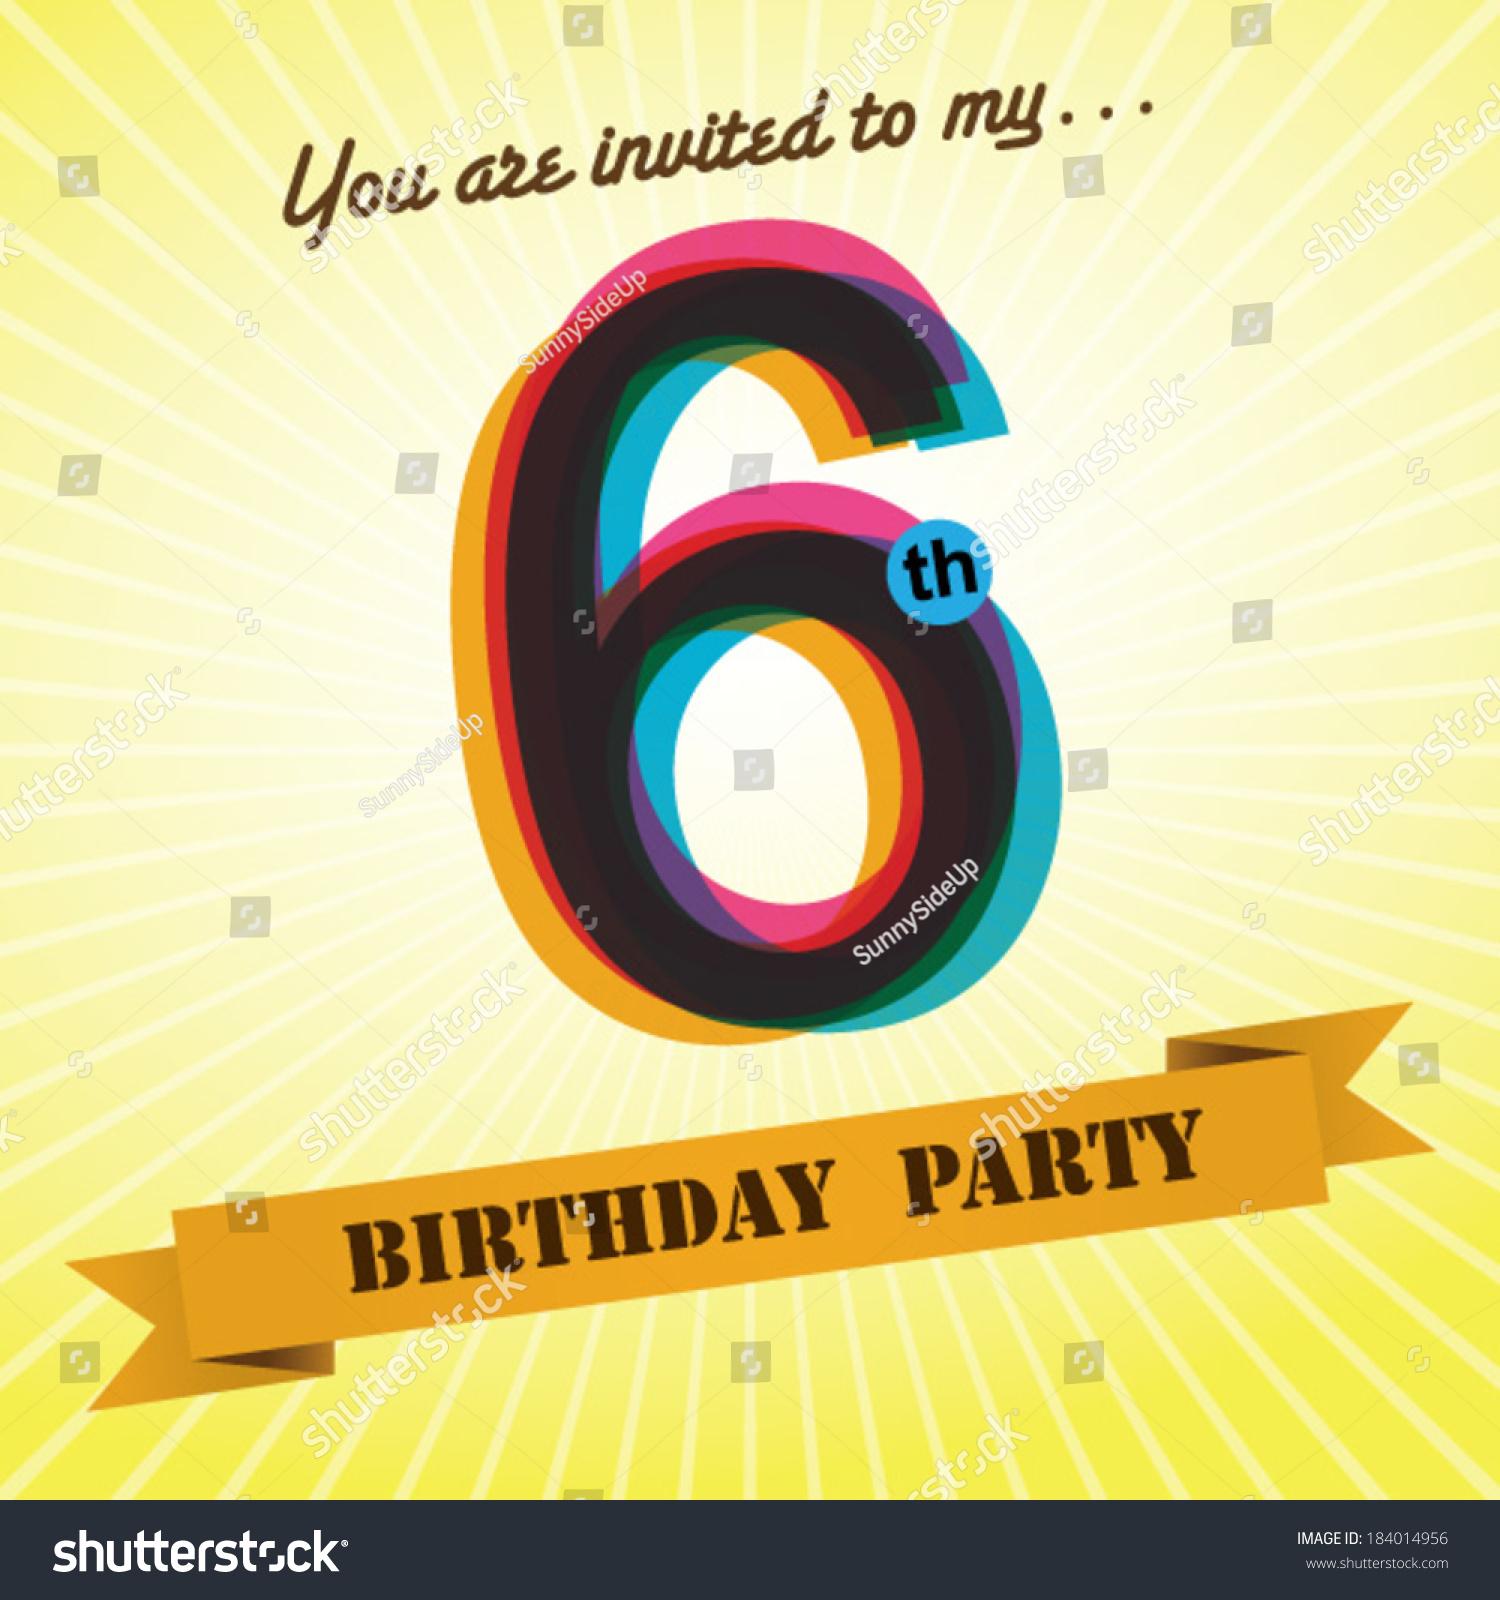 6th Birthday Party Invite Template Design Stock Vector ...